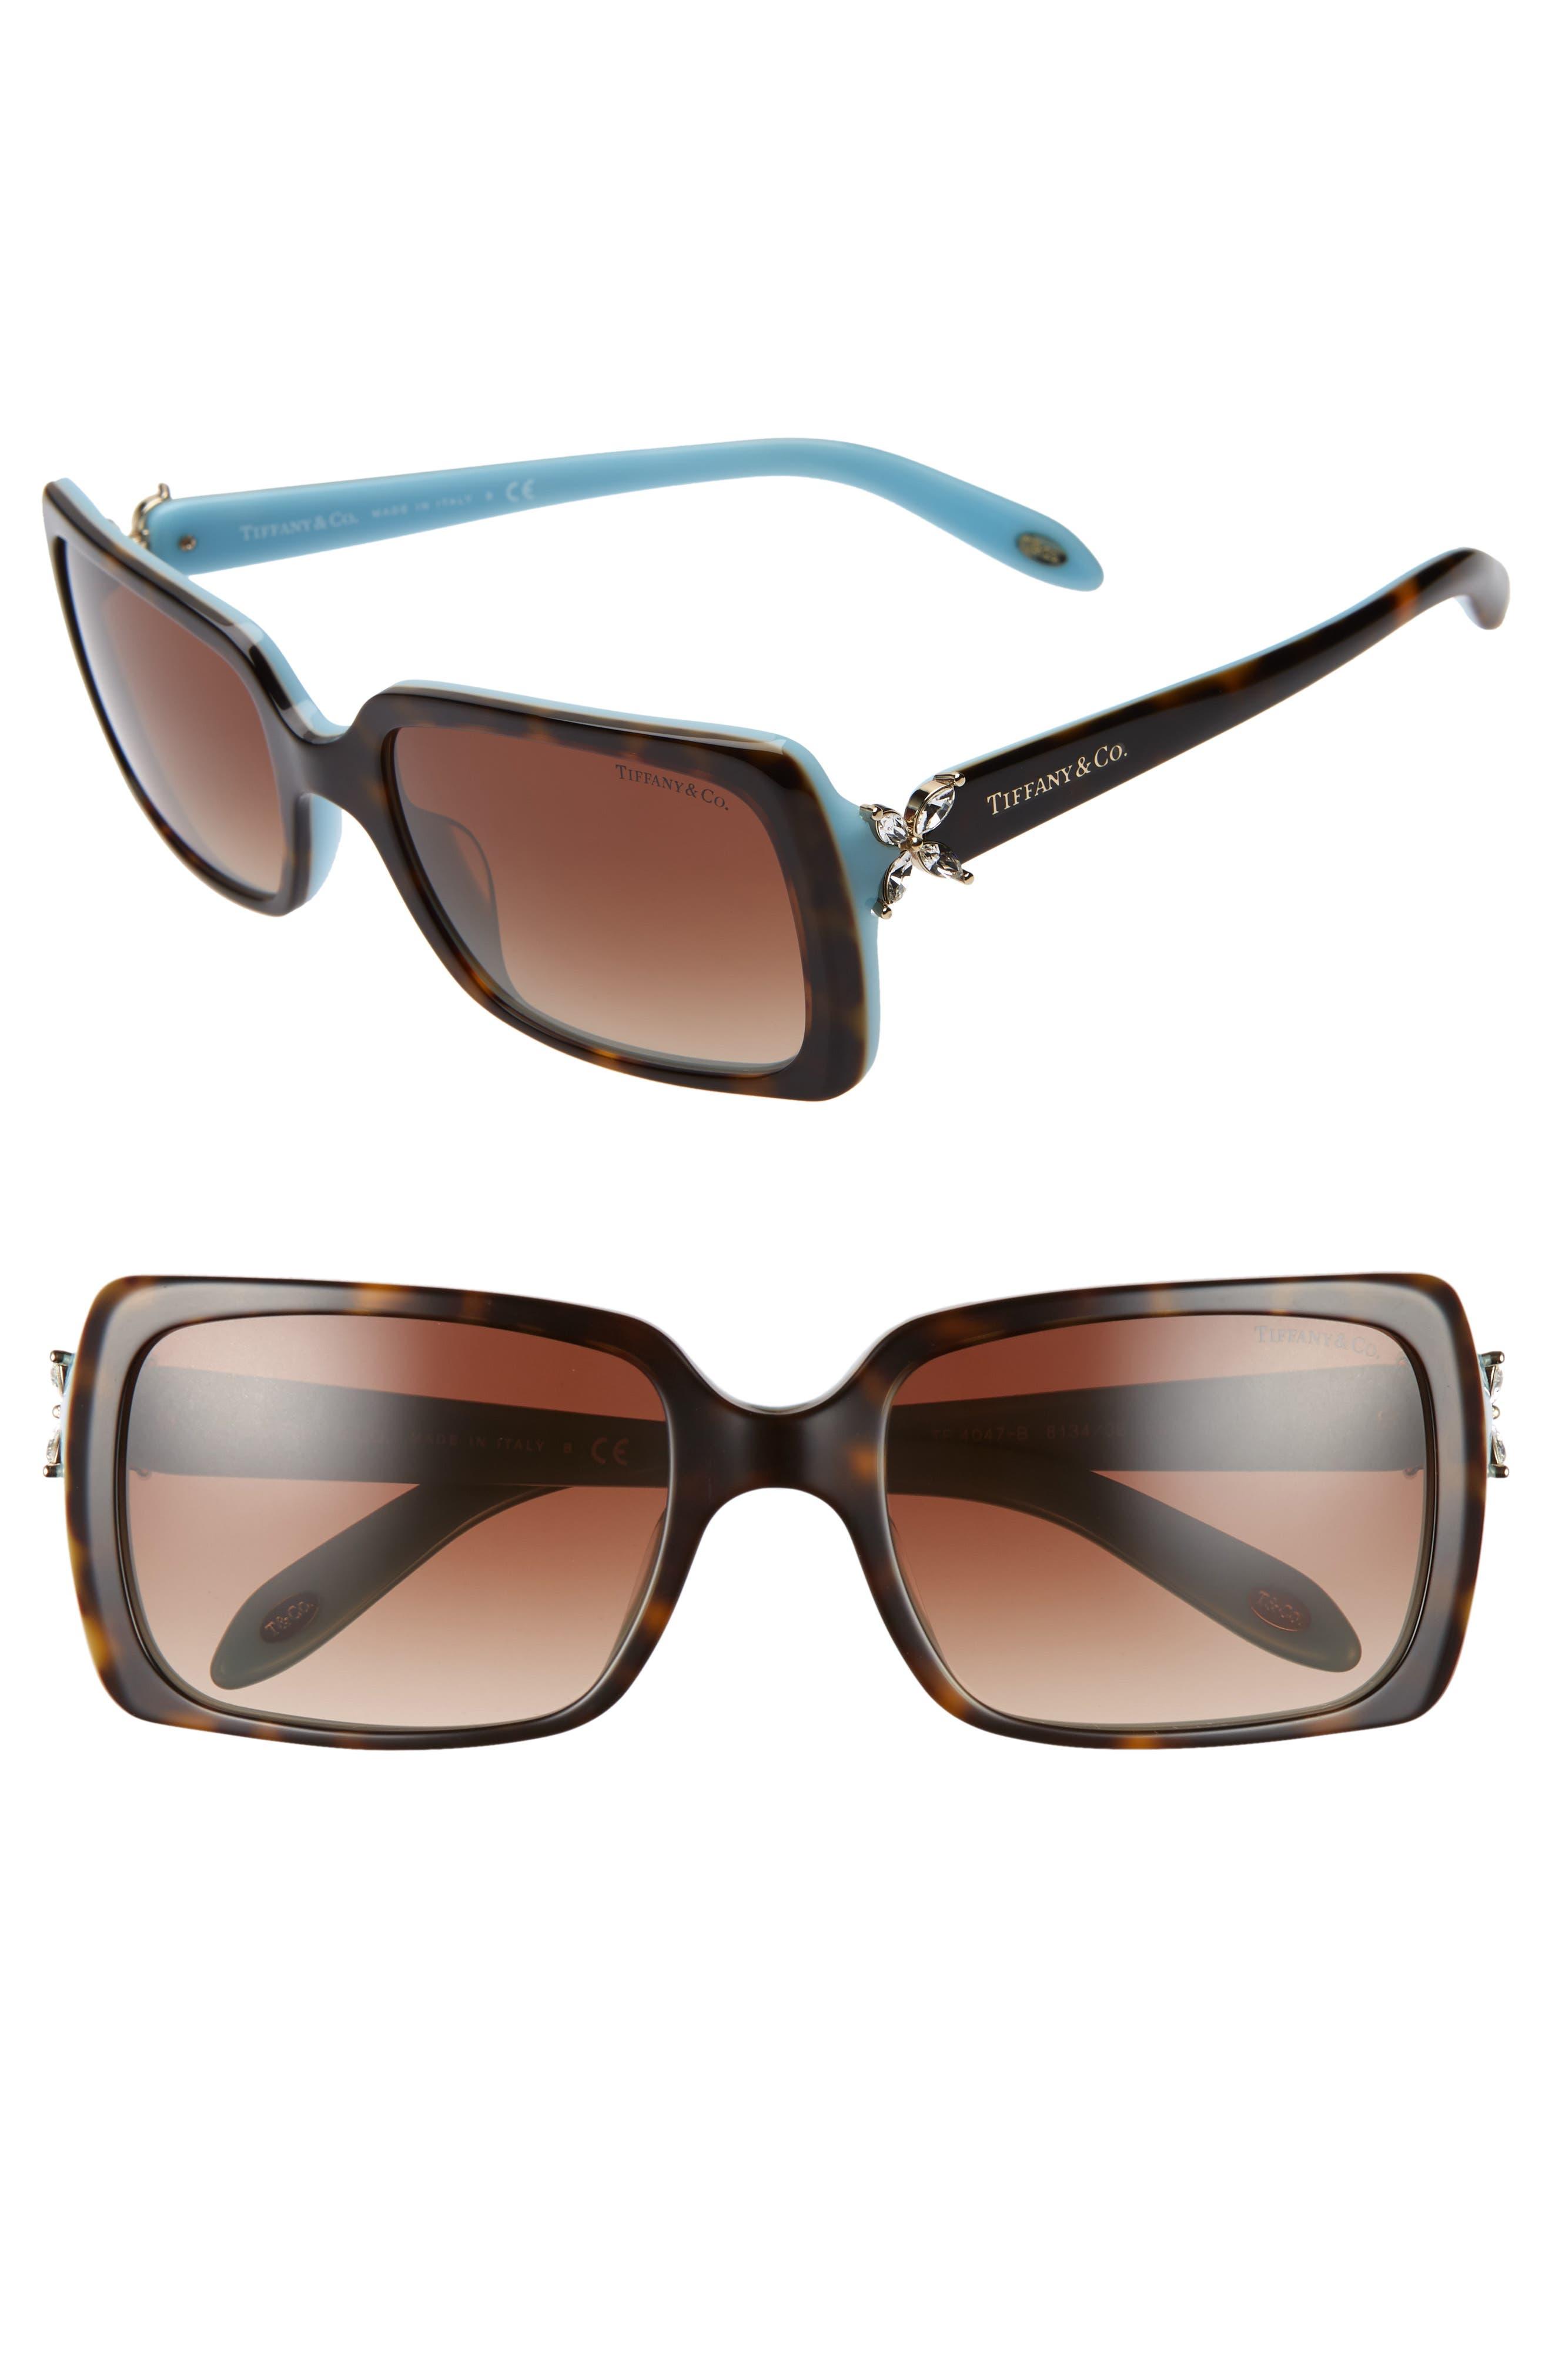 35d1478cdfb Women s Tiffany   Co. 55Mm Square Sunglasses - Top Havana  Blue brn Grad